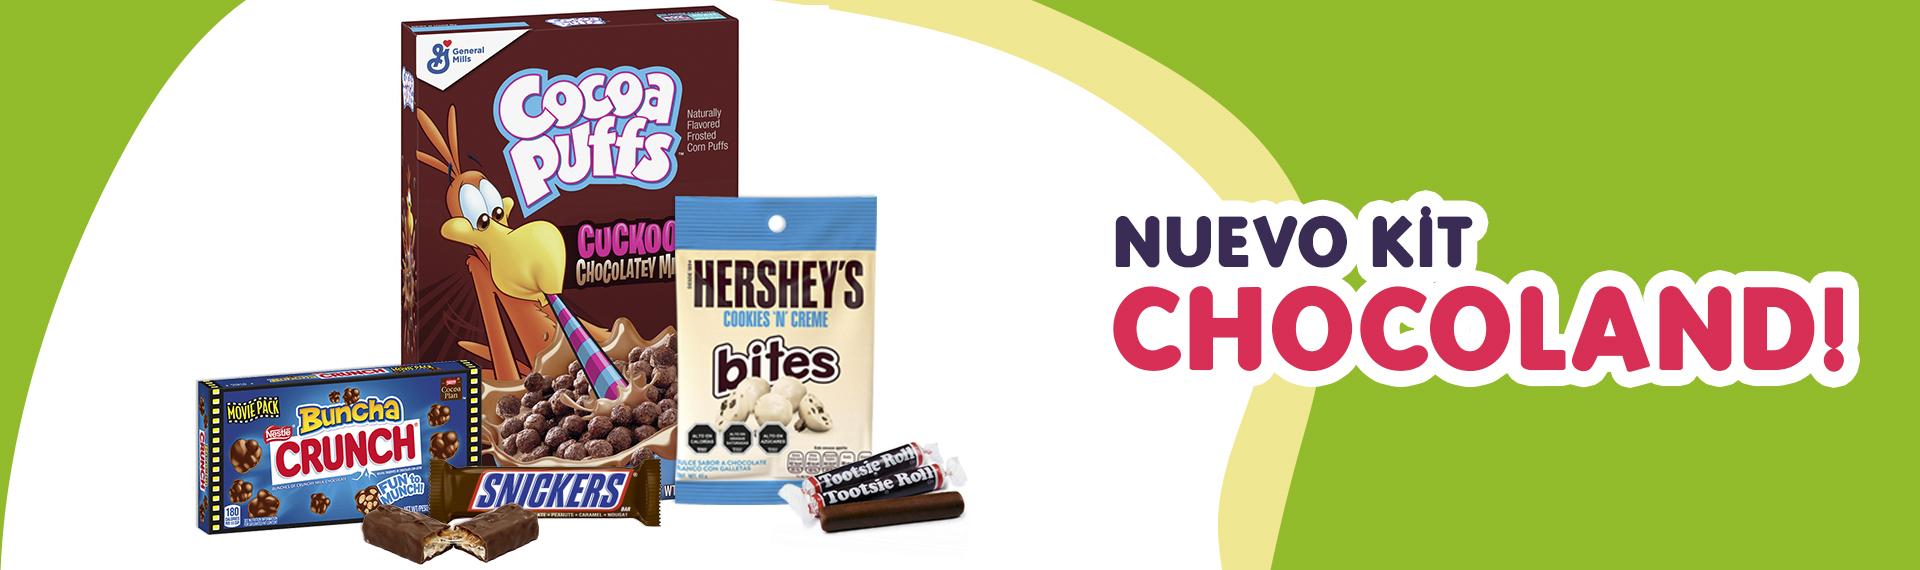 banner kit-chocoland